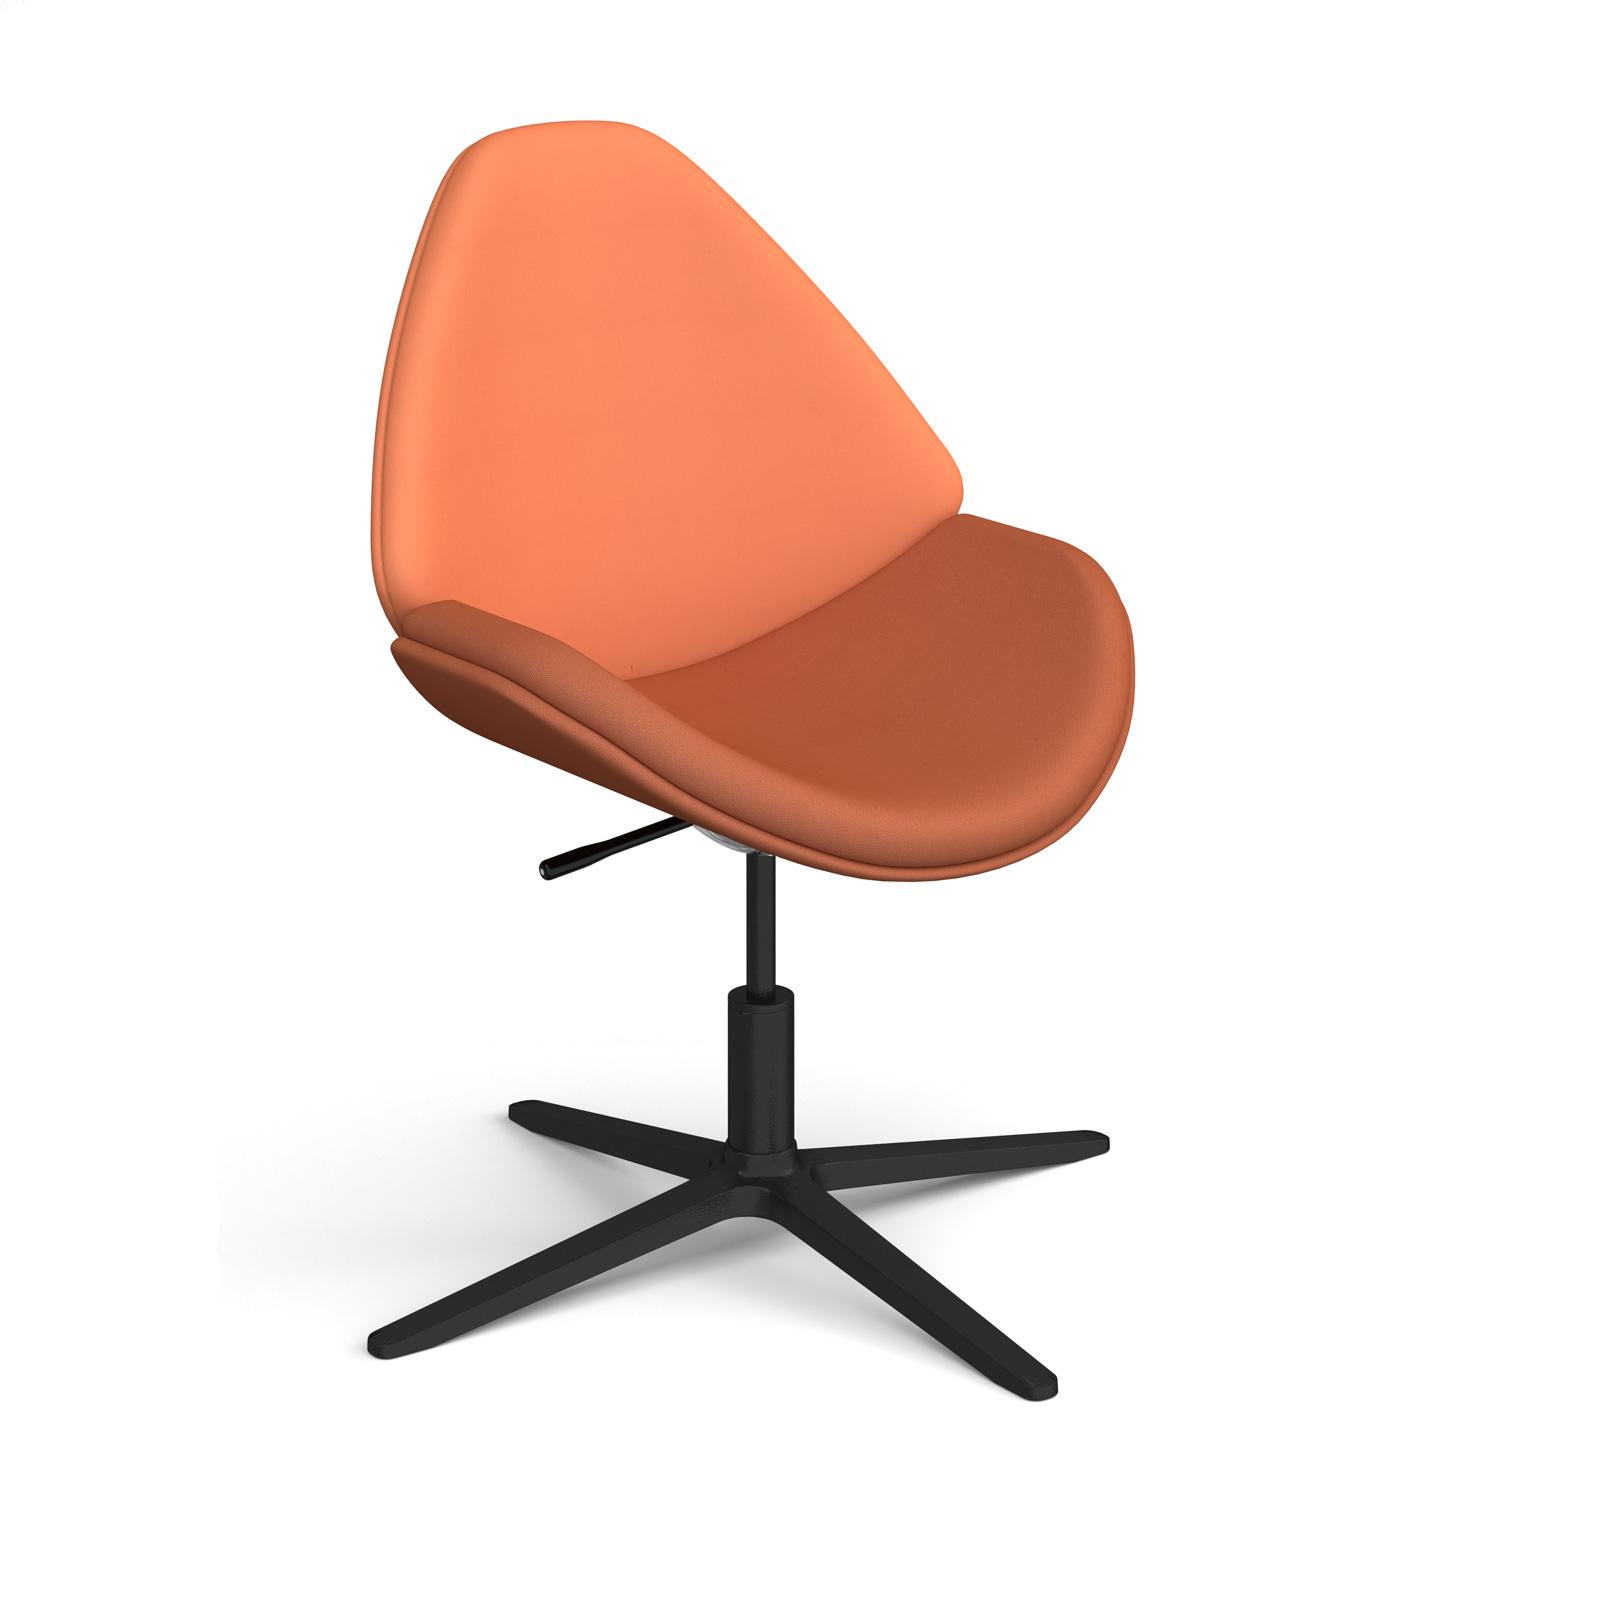 Twist & Shout Lounge Chairs